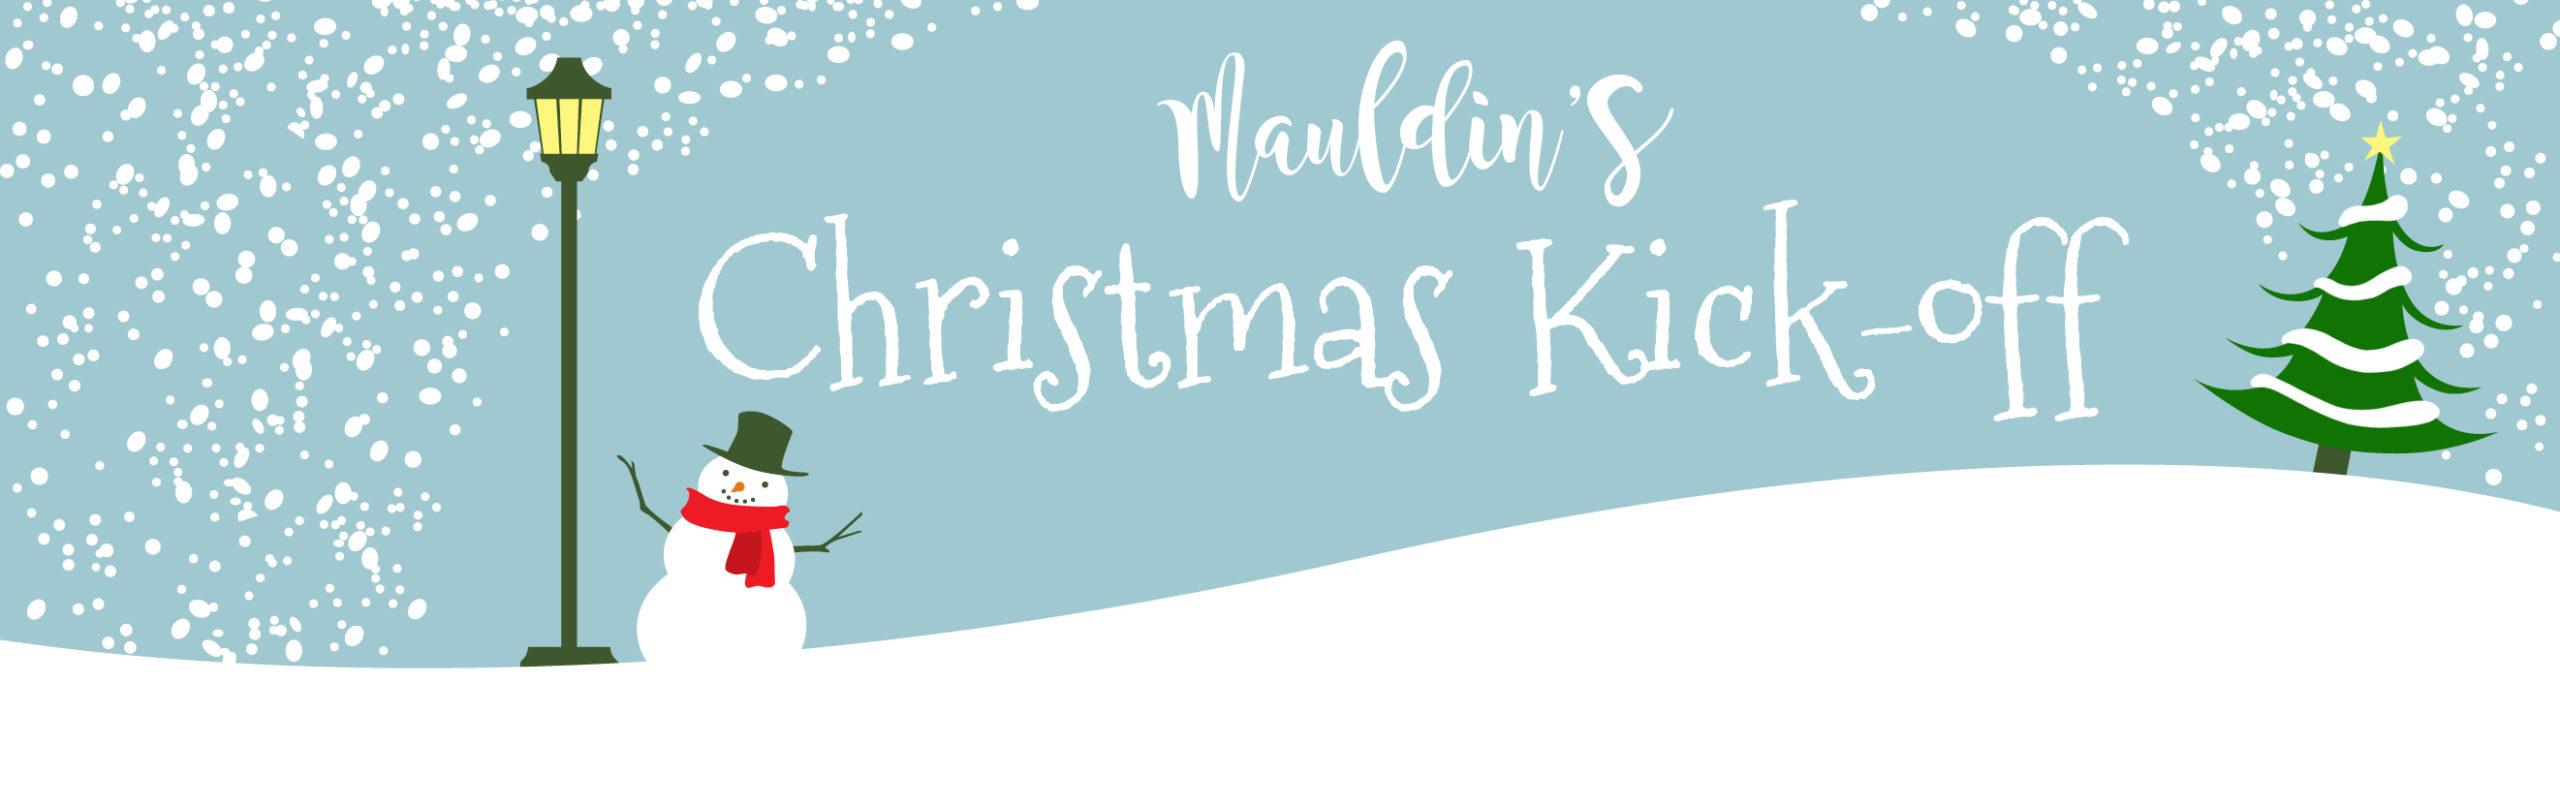 Mauldin Christmas Parade 2020 Mauldin's Christmas Kick off – Mauldin Cultural Center